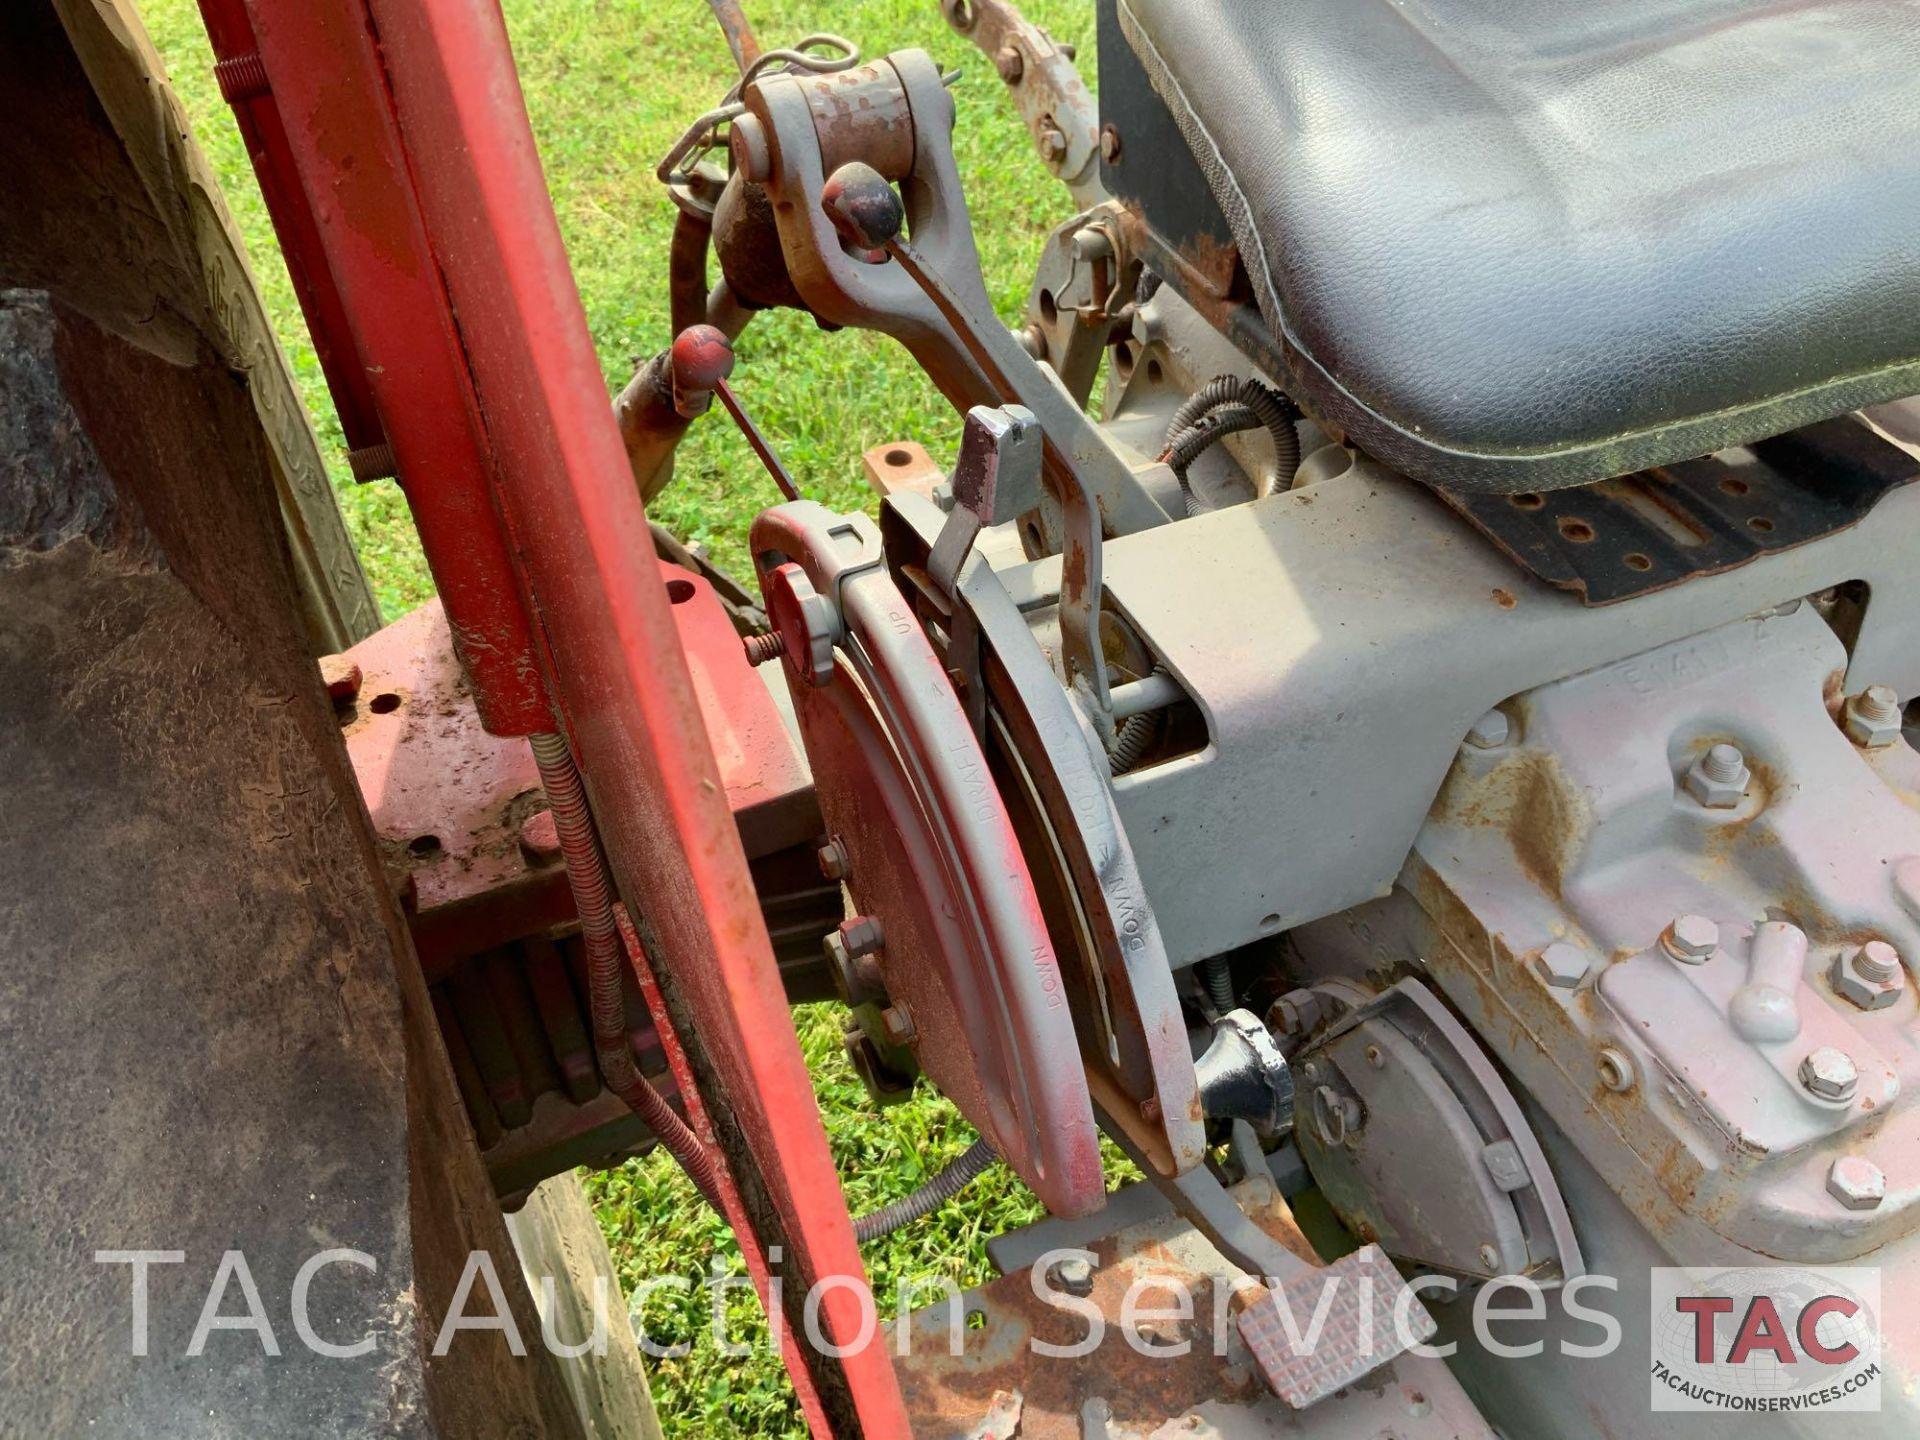 Massey Ferguson 275 Farm Tractor - Image 22 of 25